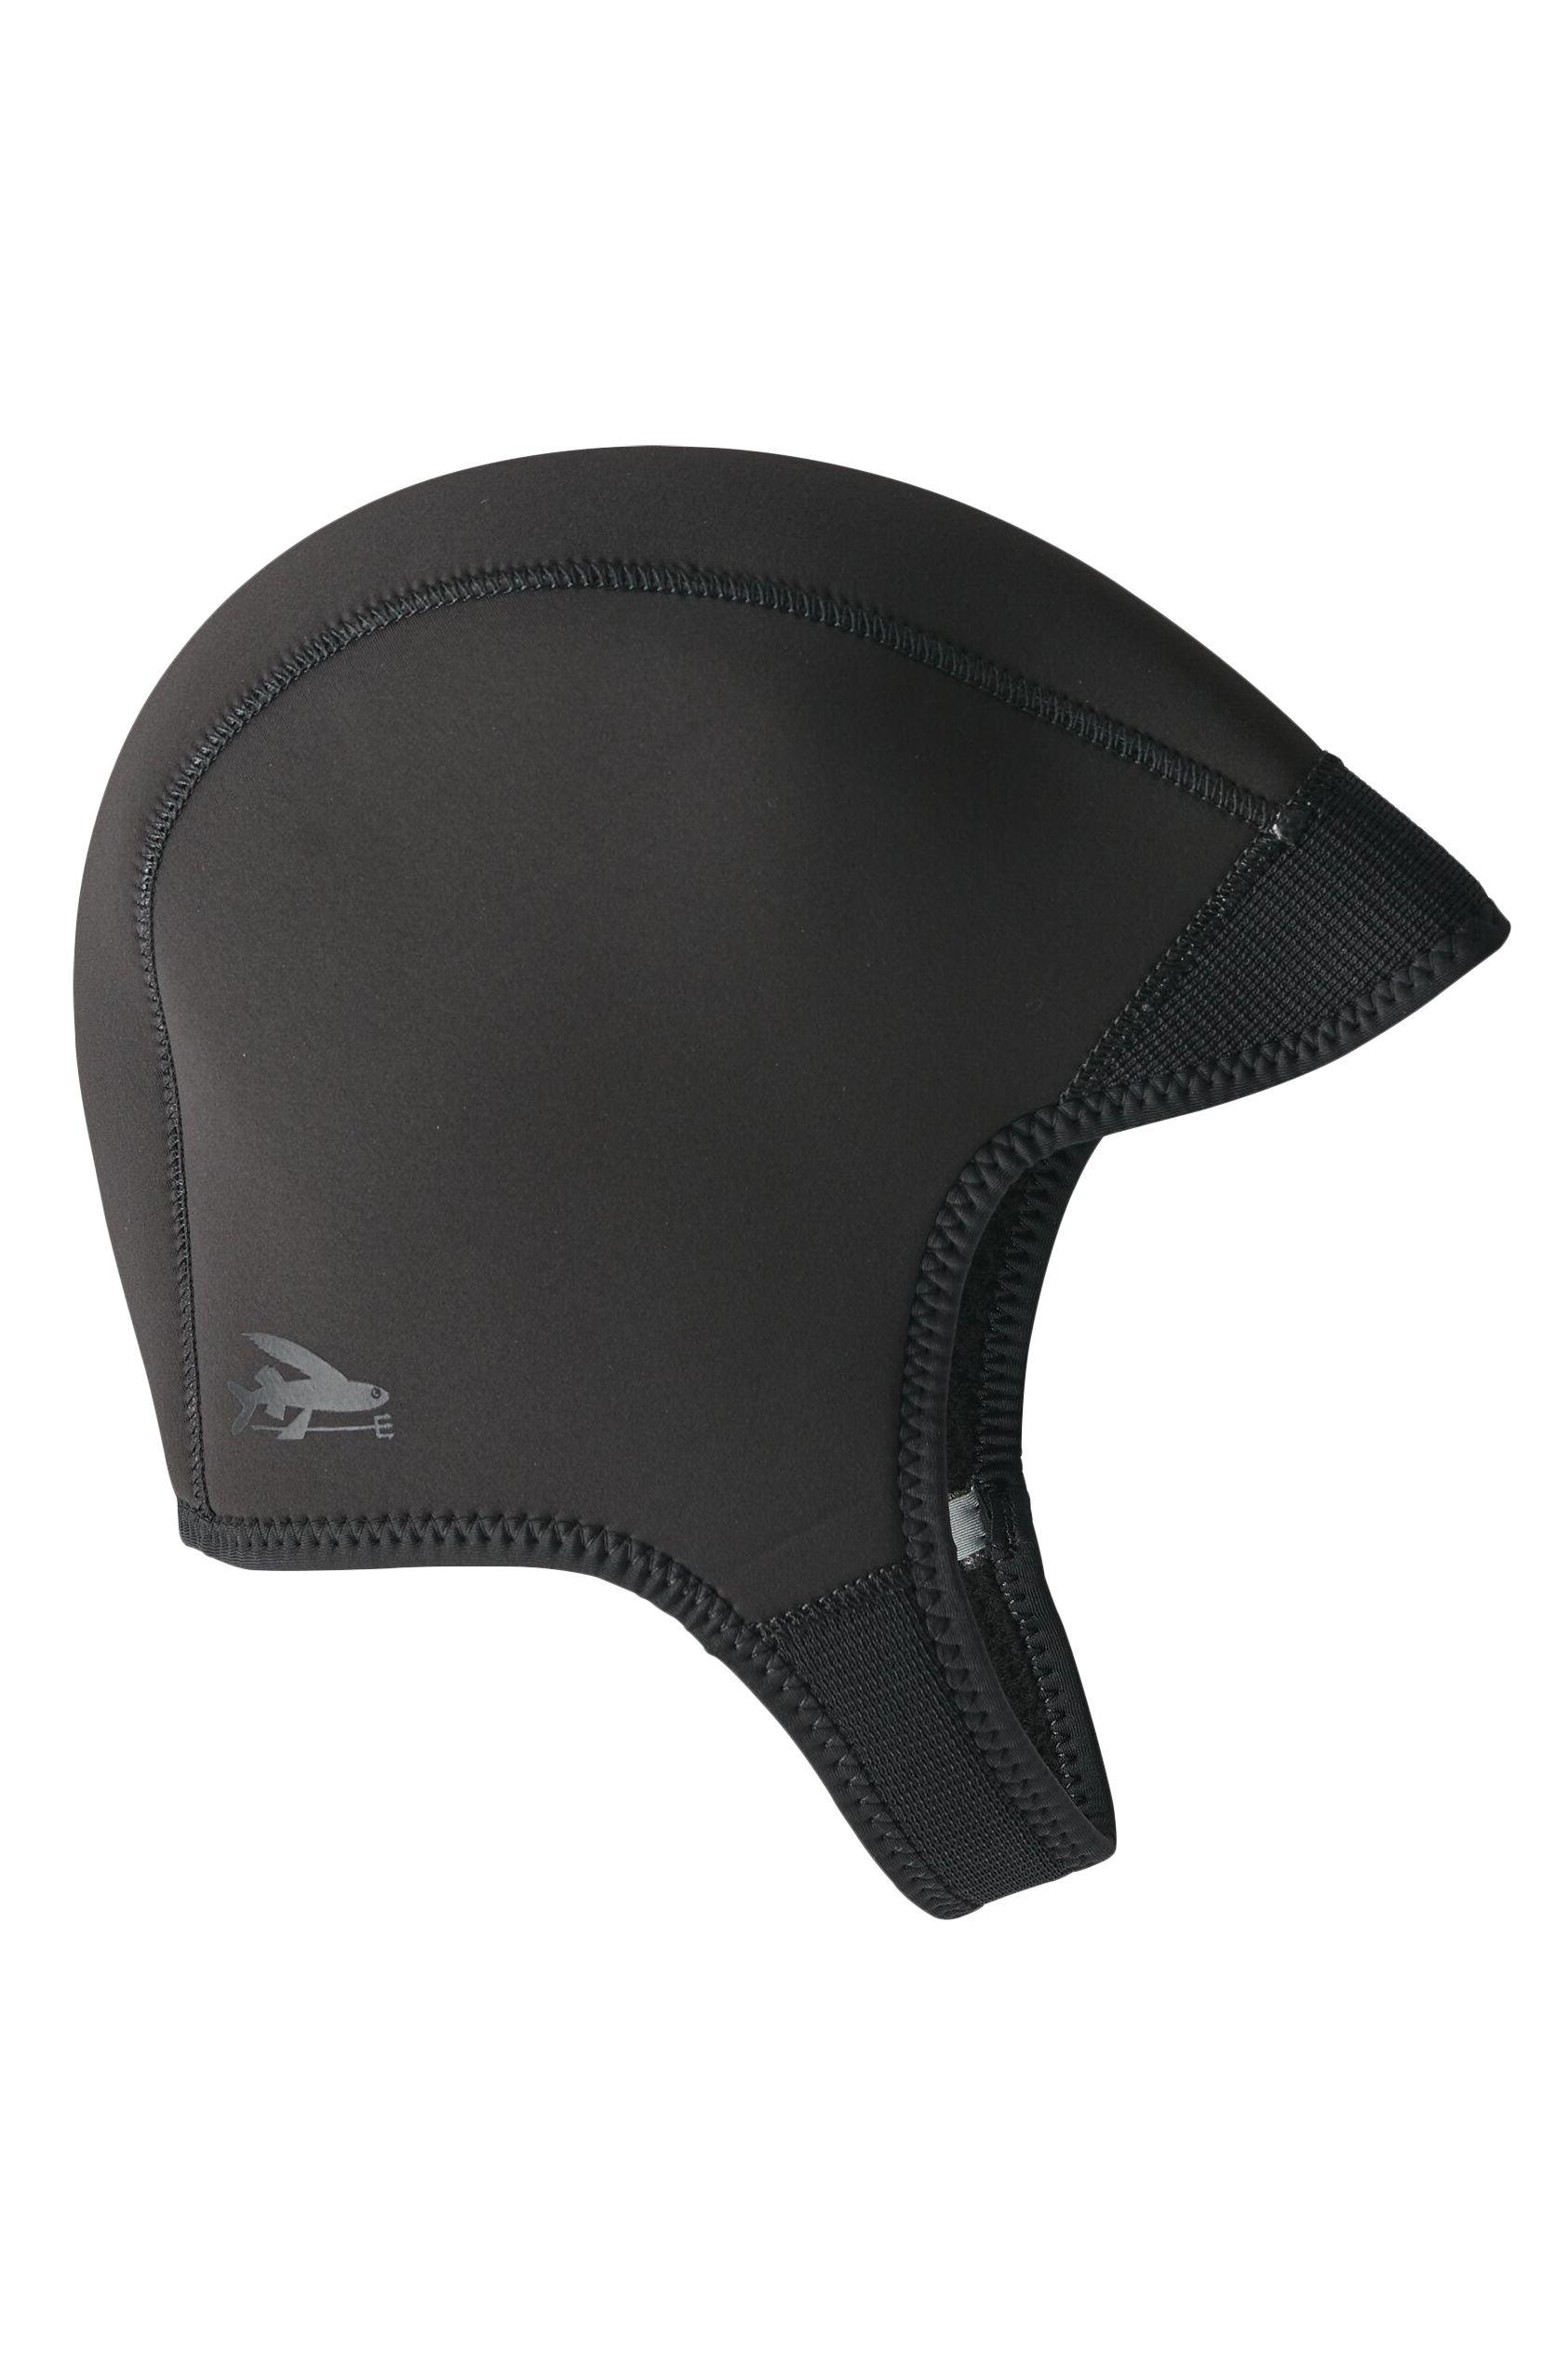 Patagonia Neoprene Hoods R3 YULEX CAP Black